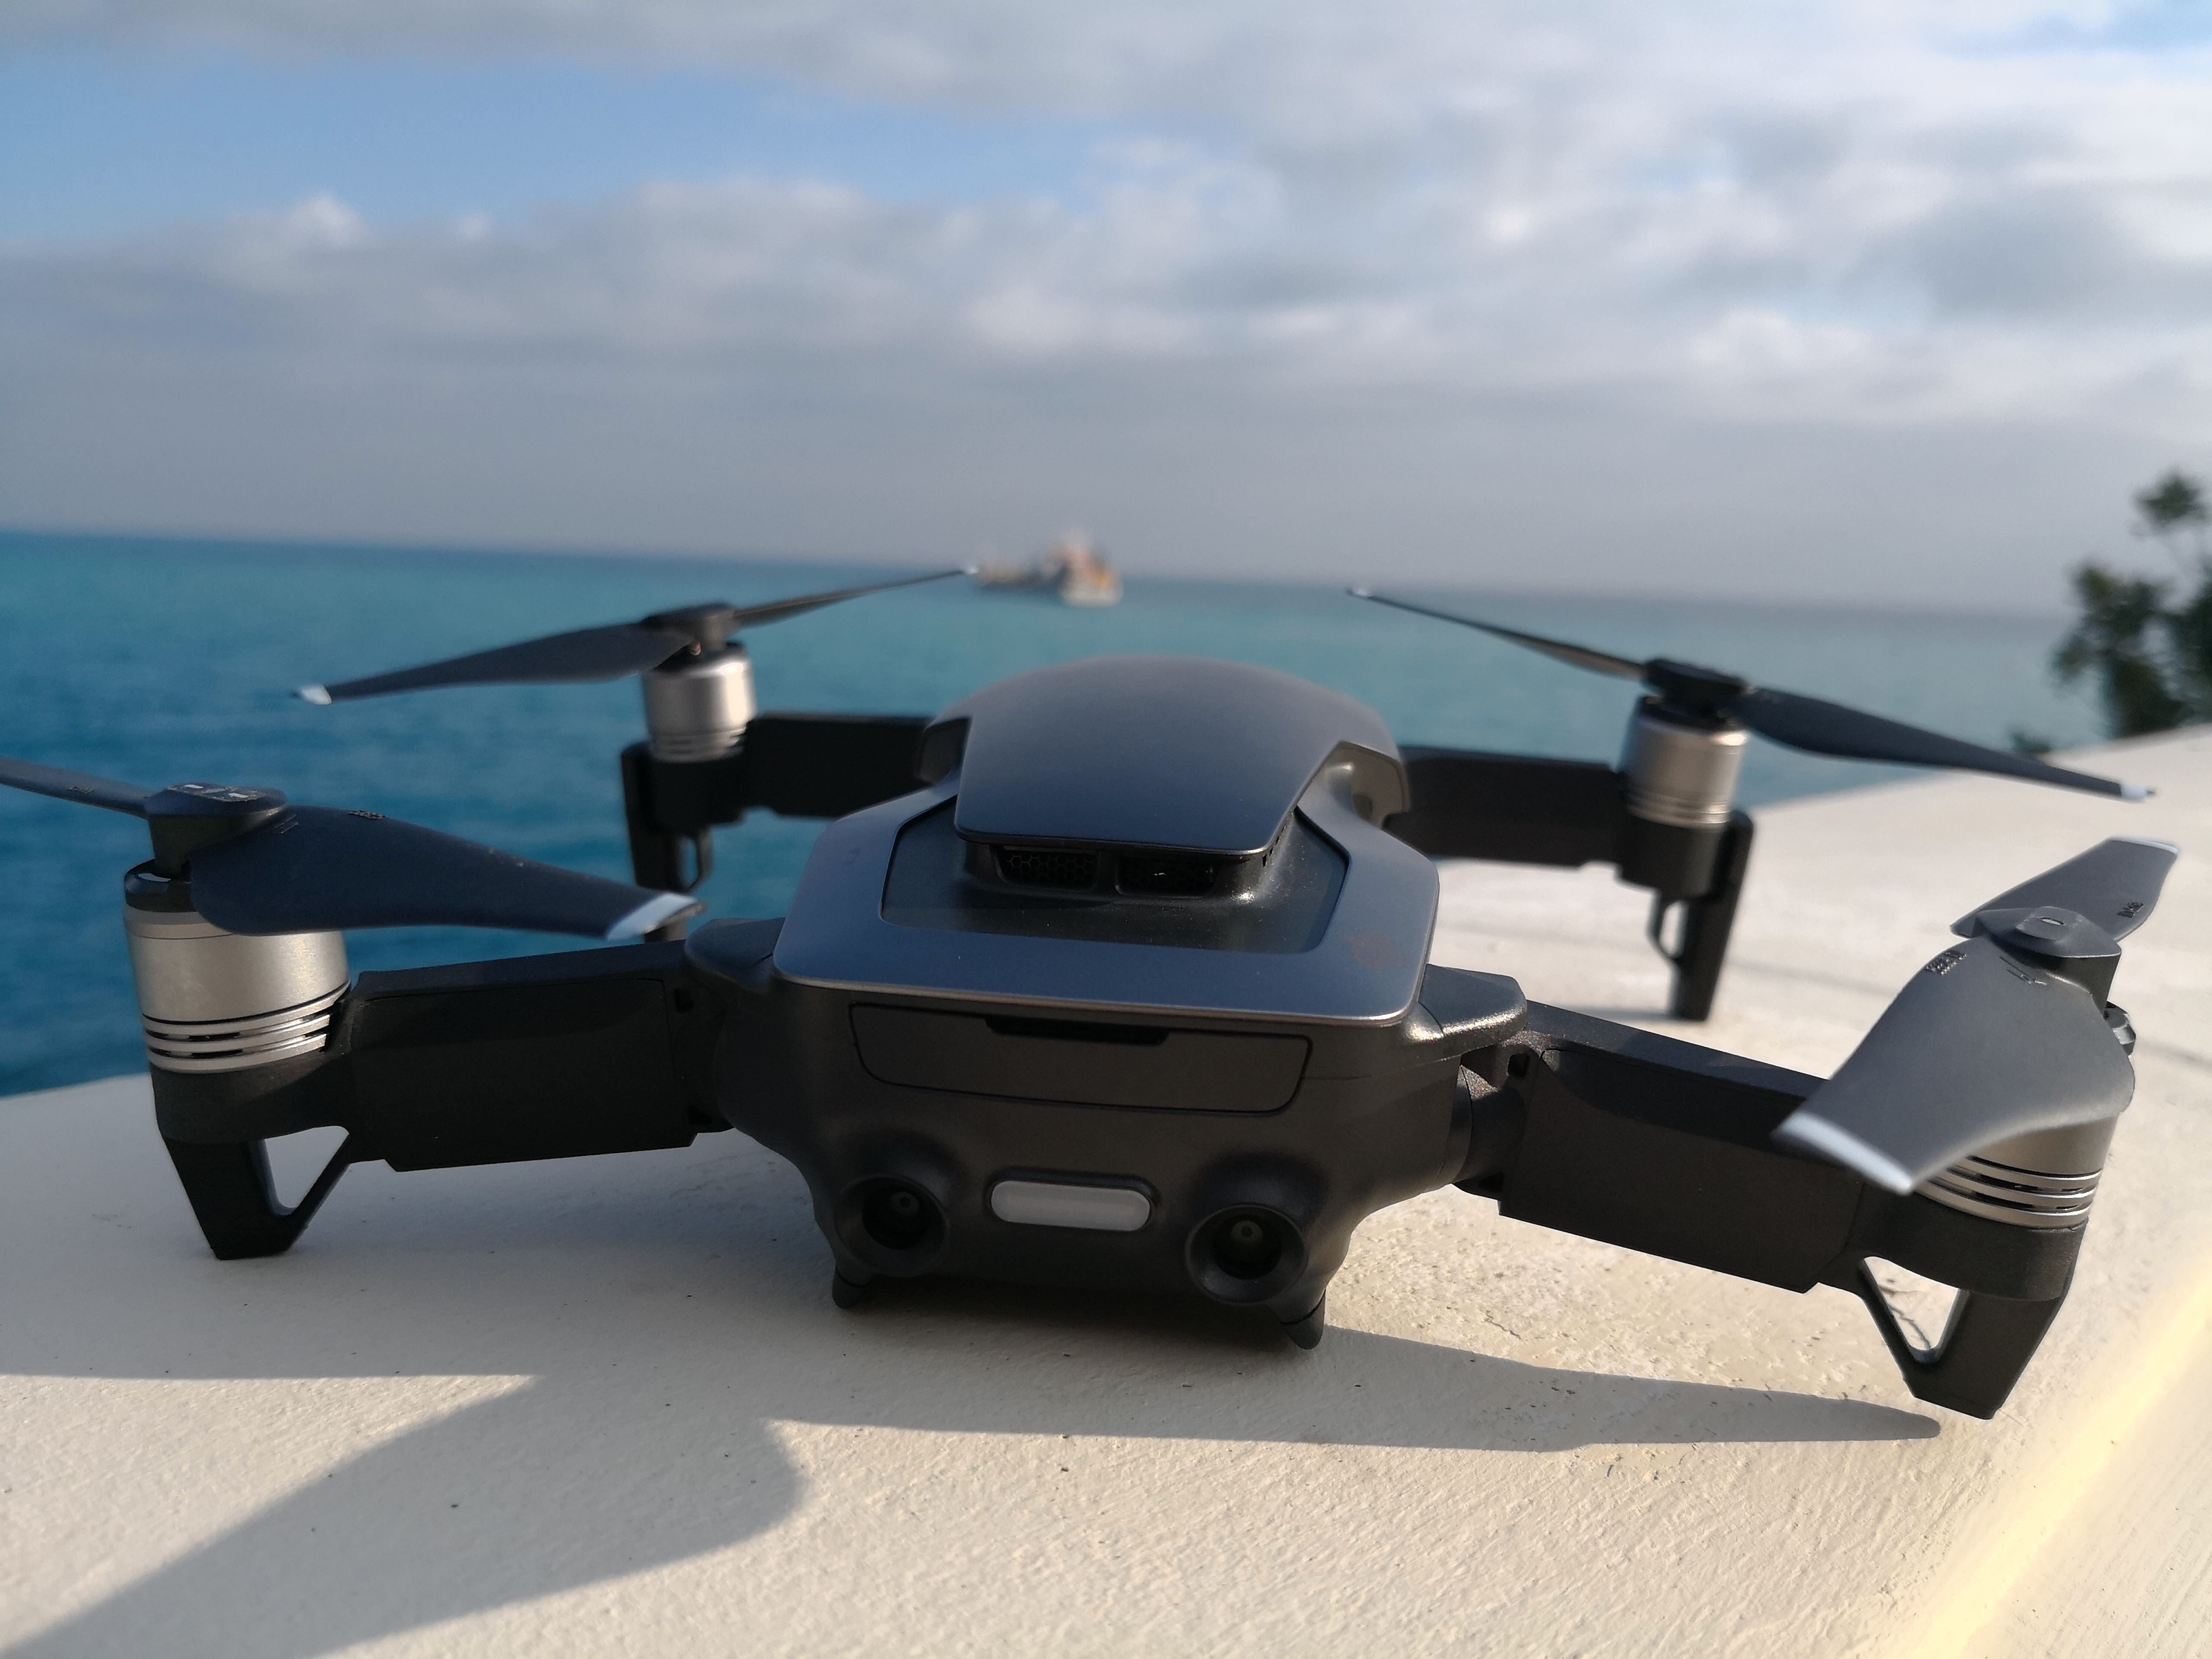 acheter drone albi